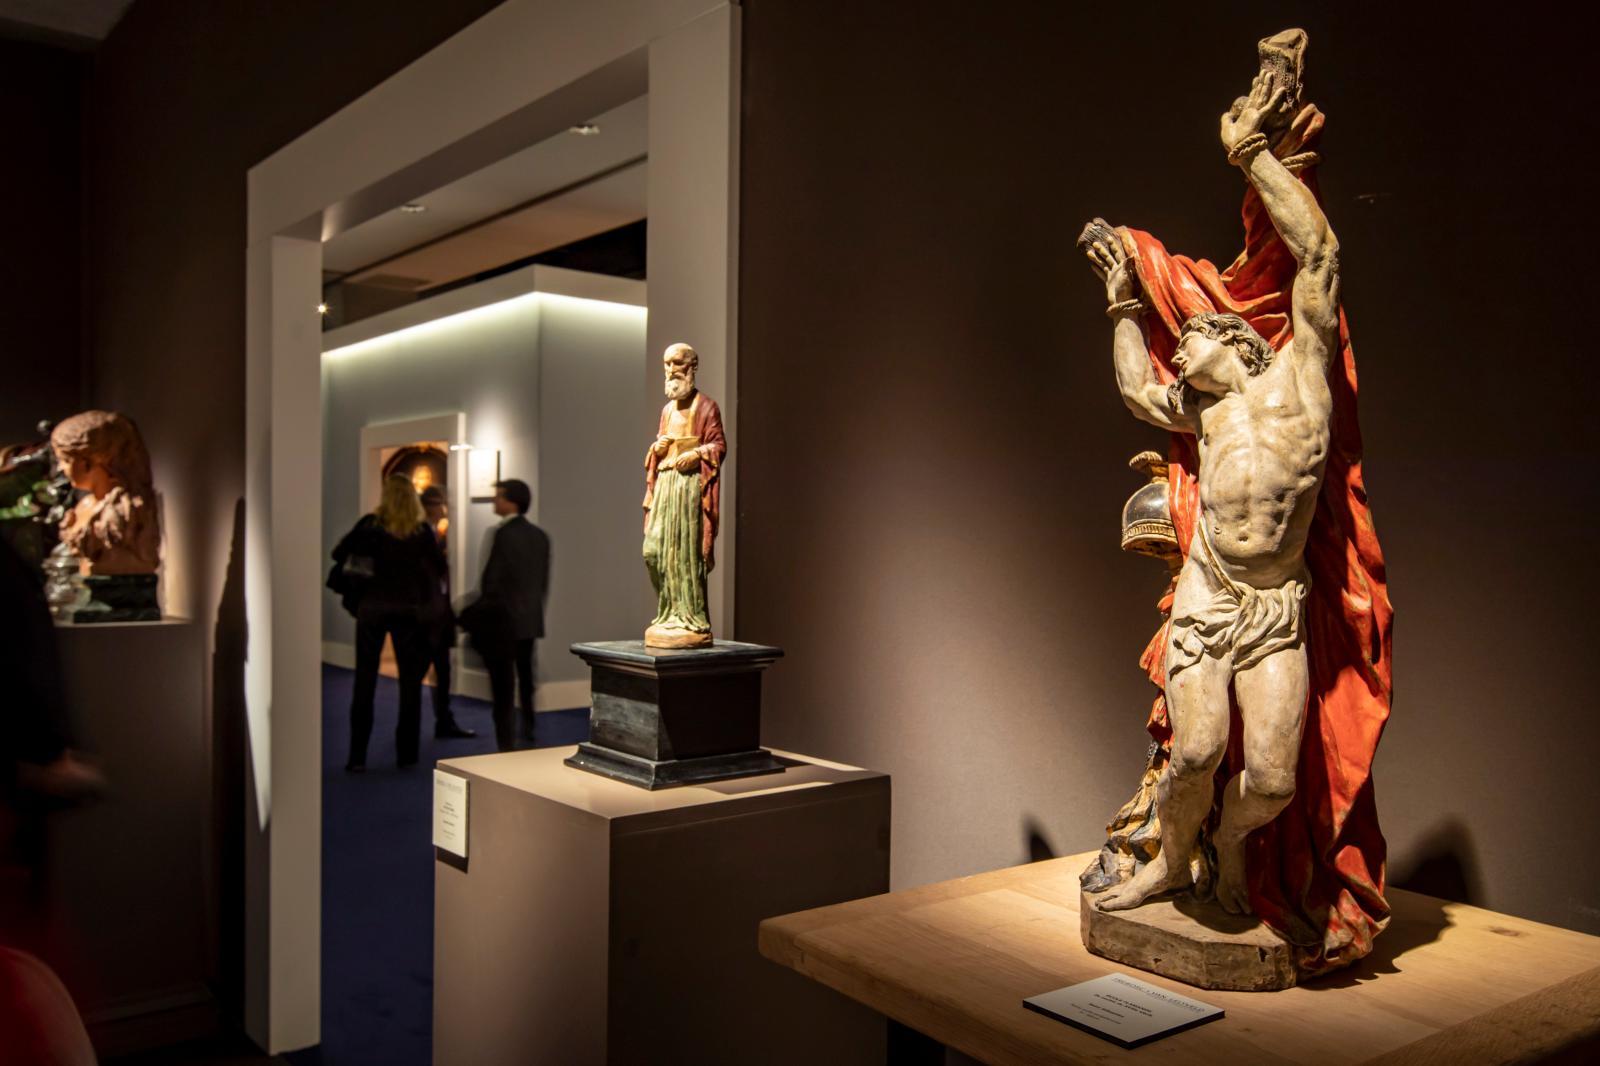 The Trebosc & Van Lelyveld stand at Fine Arts Paris, 2019© Tanguy de Montesson